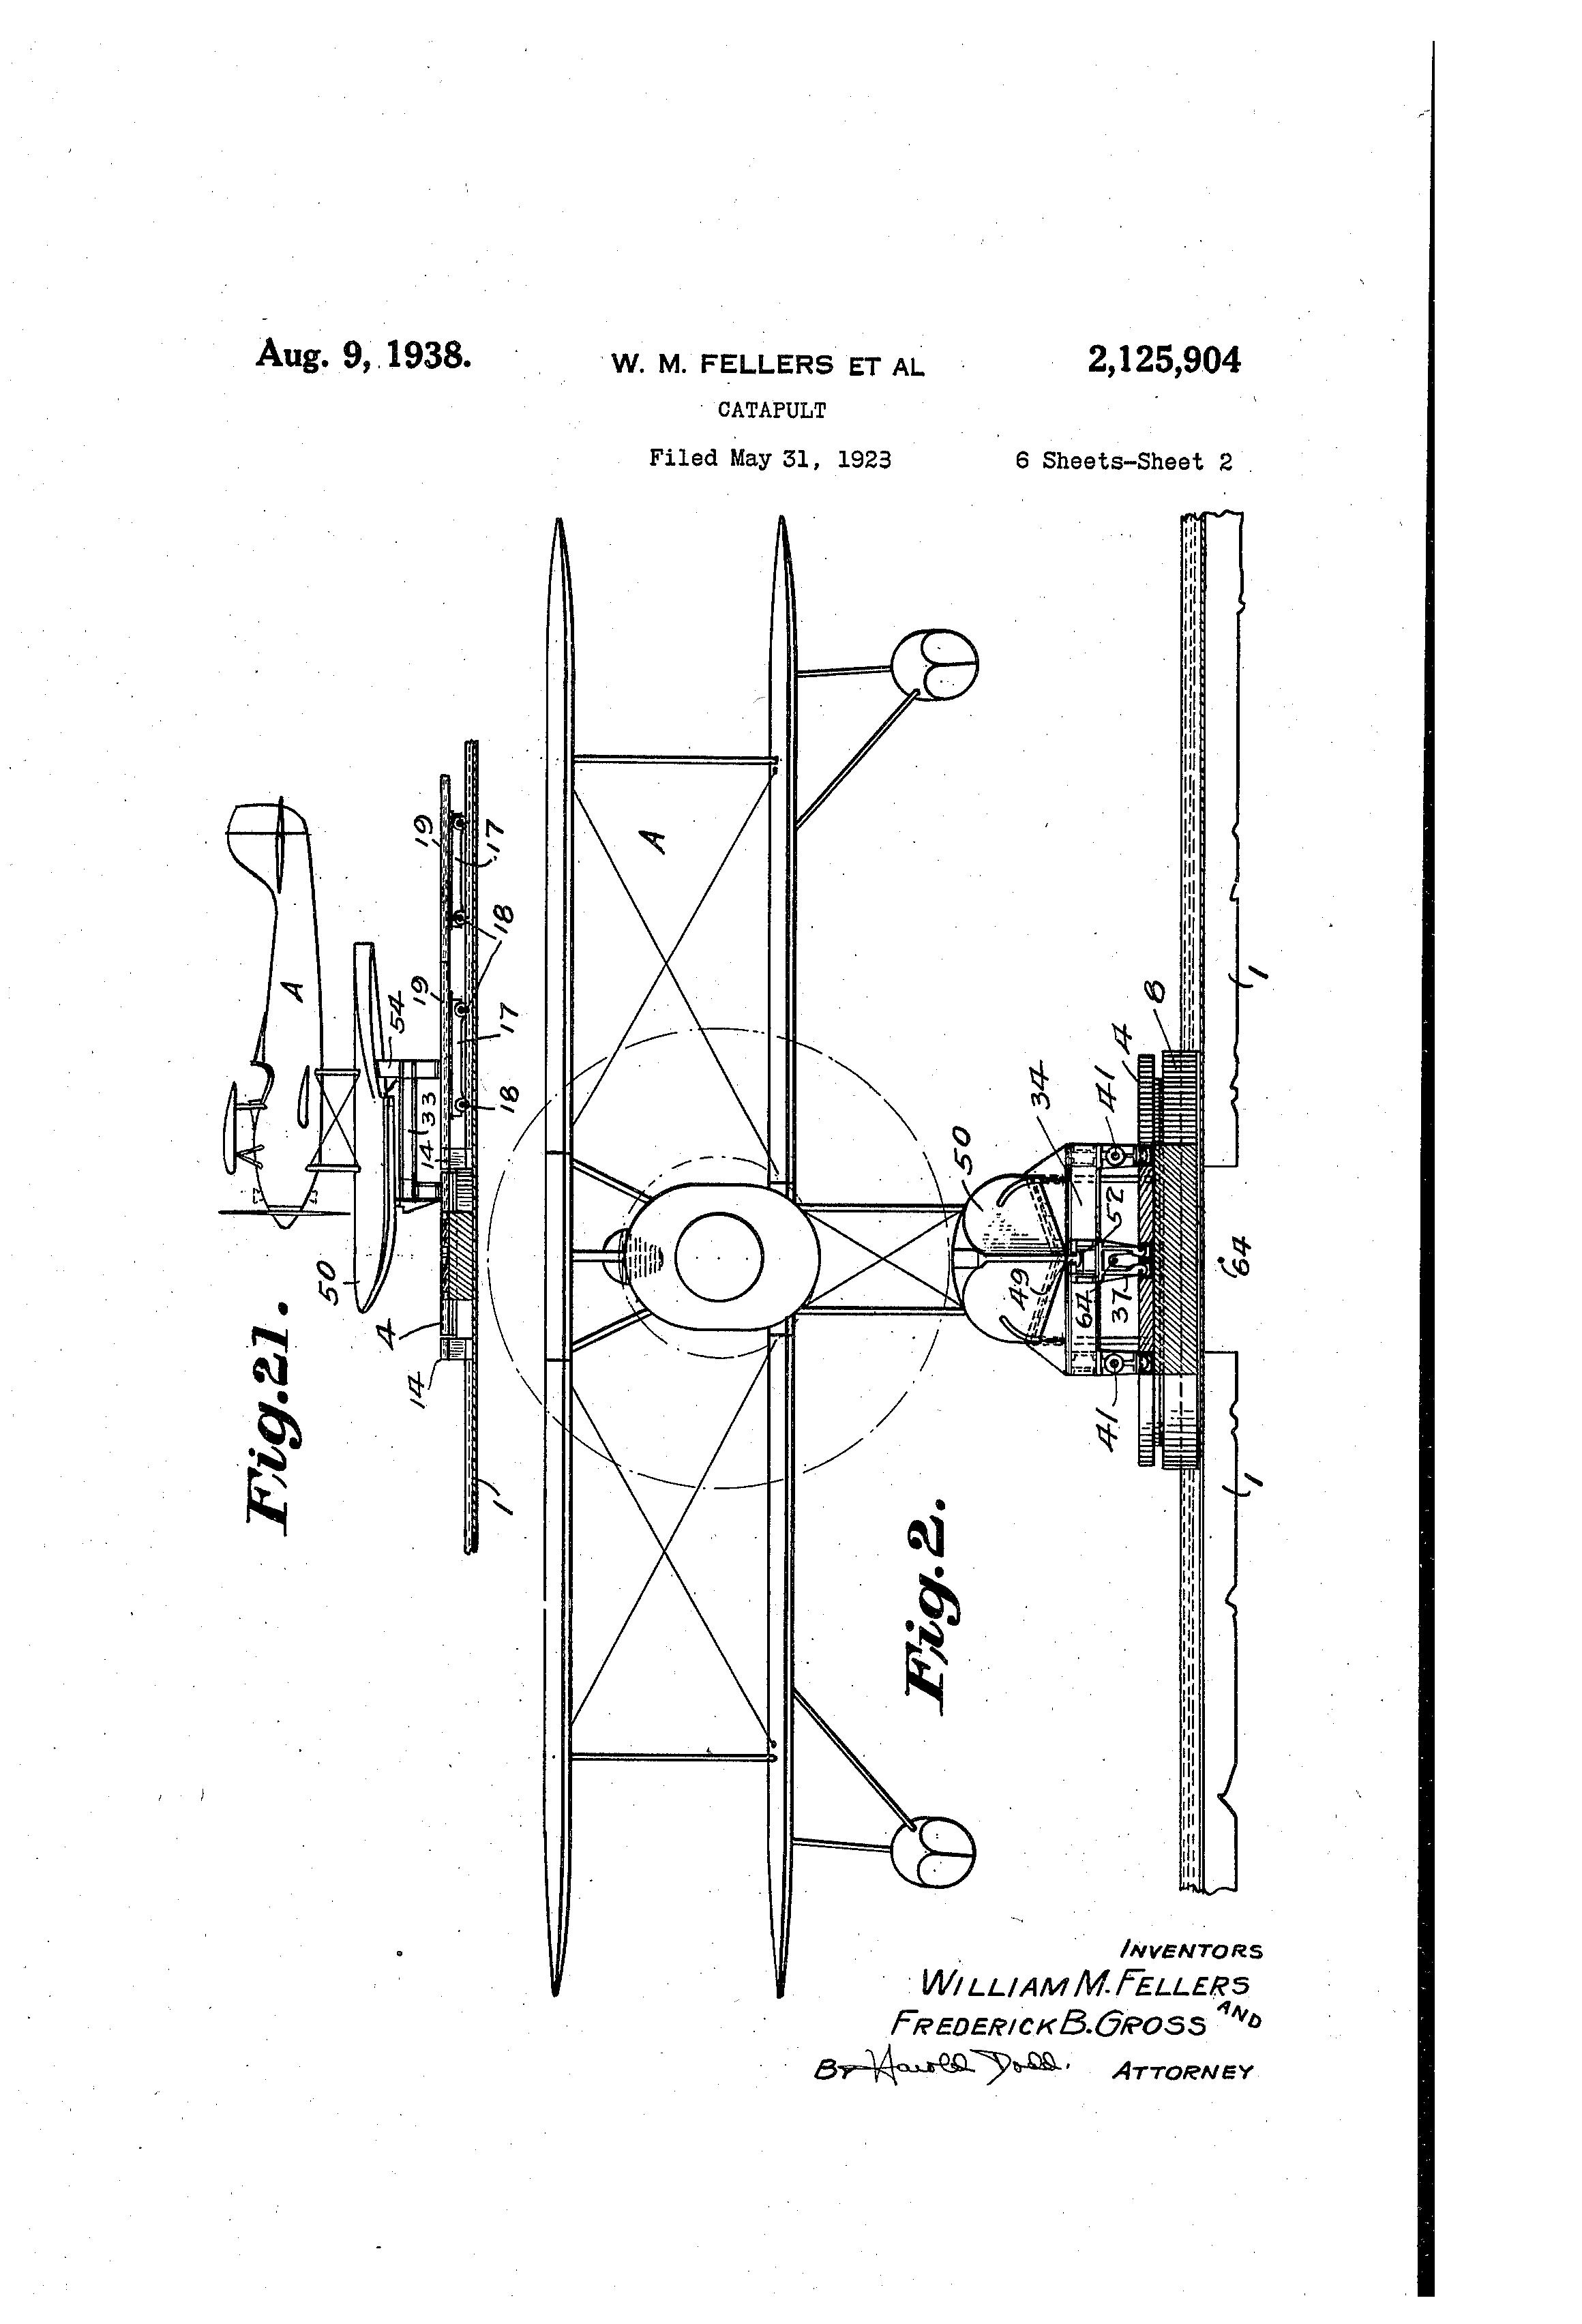 Brevet Us2125904 Catapult Google Brevets Diagram Of A Patent Drawing